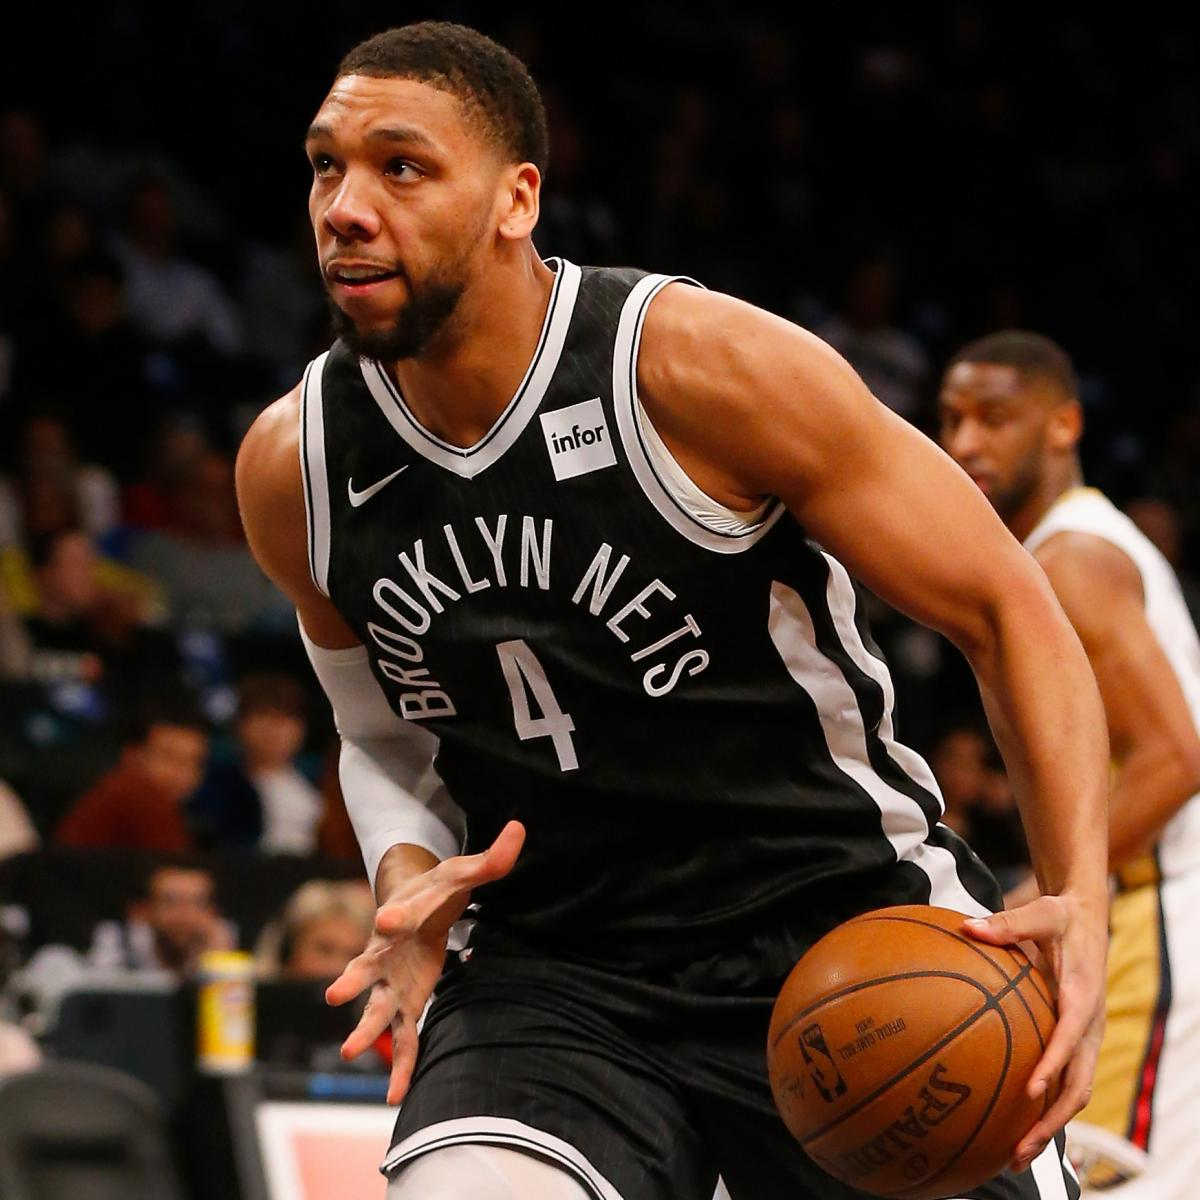 6 Former NBA Lottery Picks Facing Make-or-Break Seasons